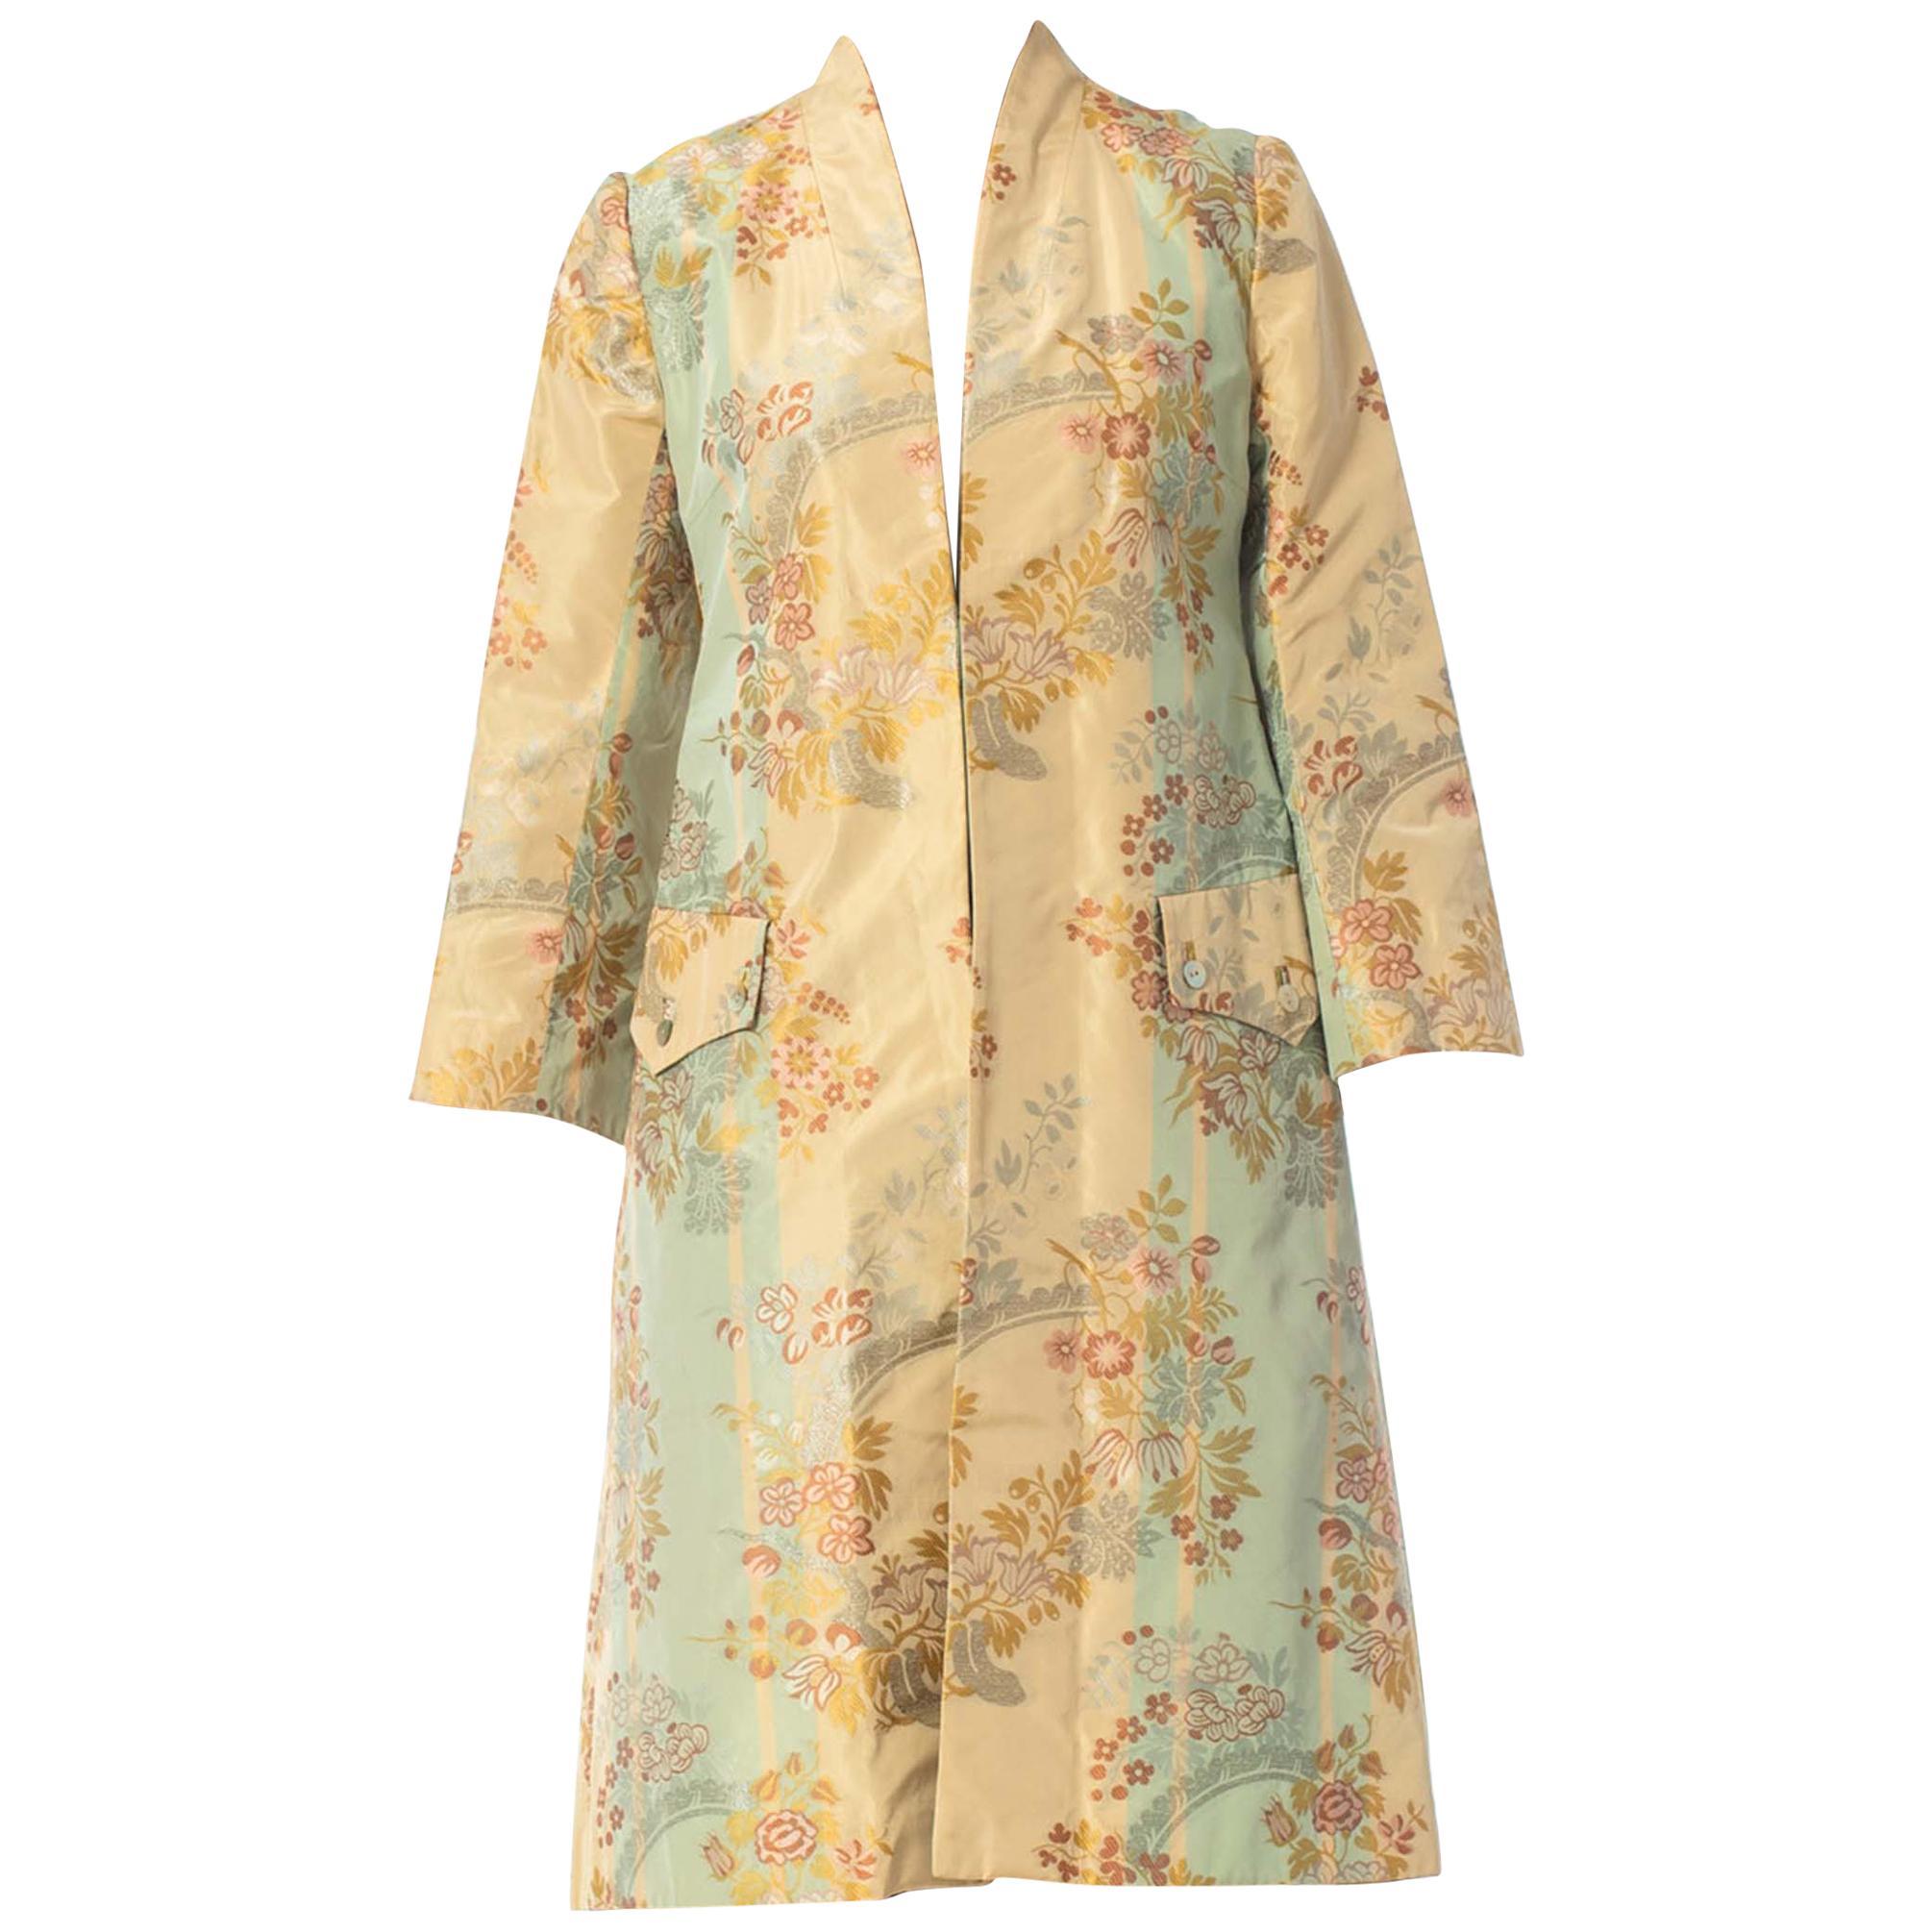 2000S ALEXANDER MCQUEEN Silk Brocade Frock Coat Jacket From The Shipwreck Colle